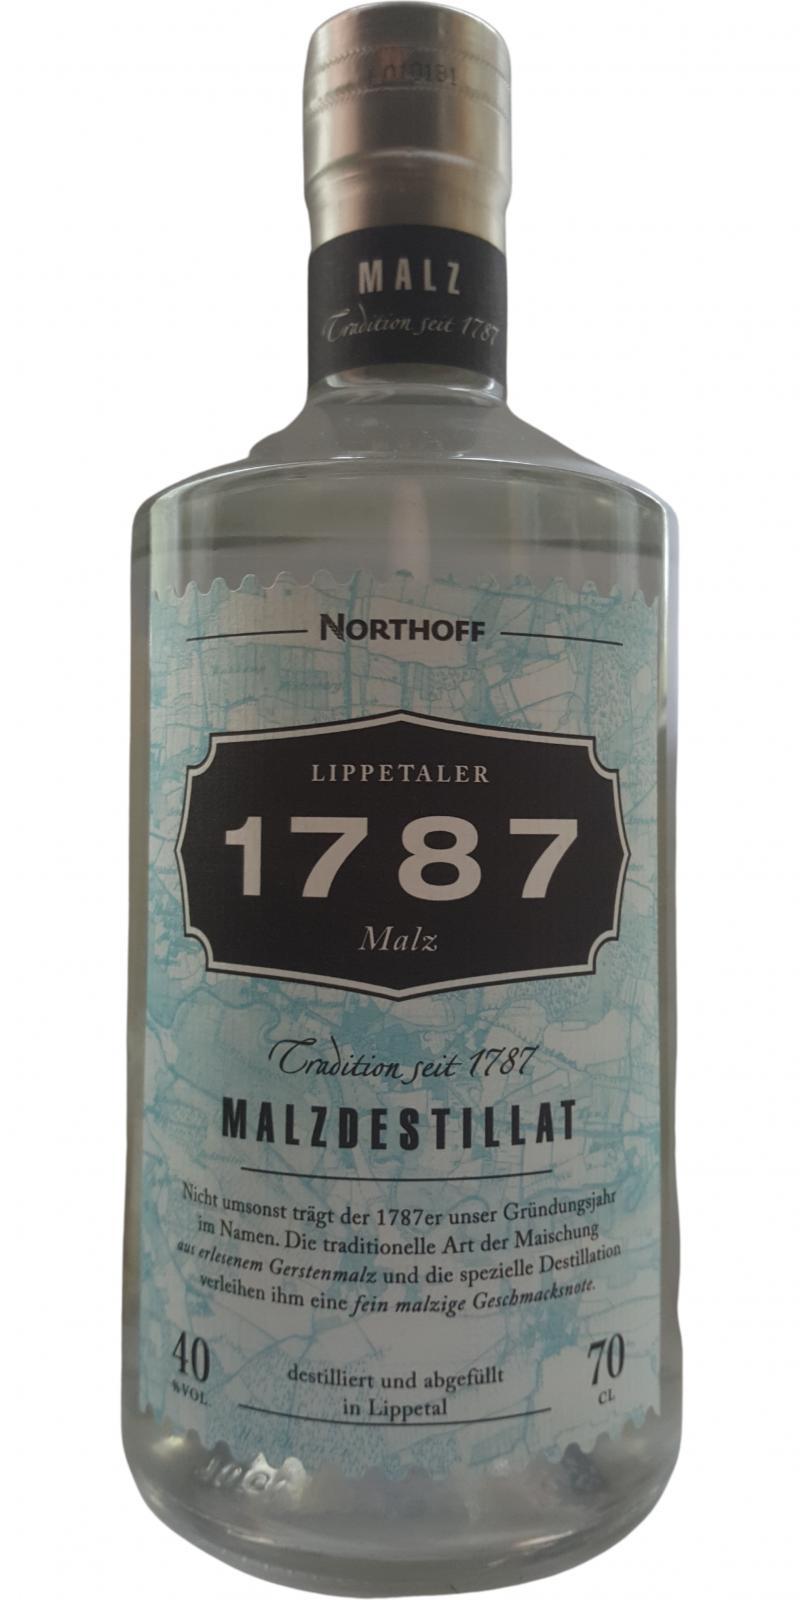 1787 Malzdestillat